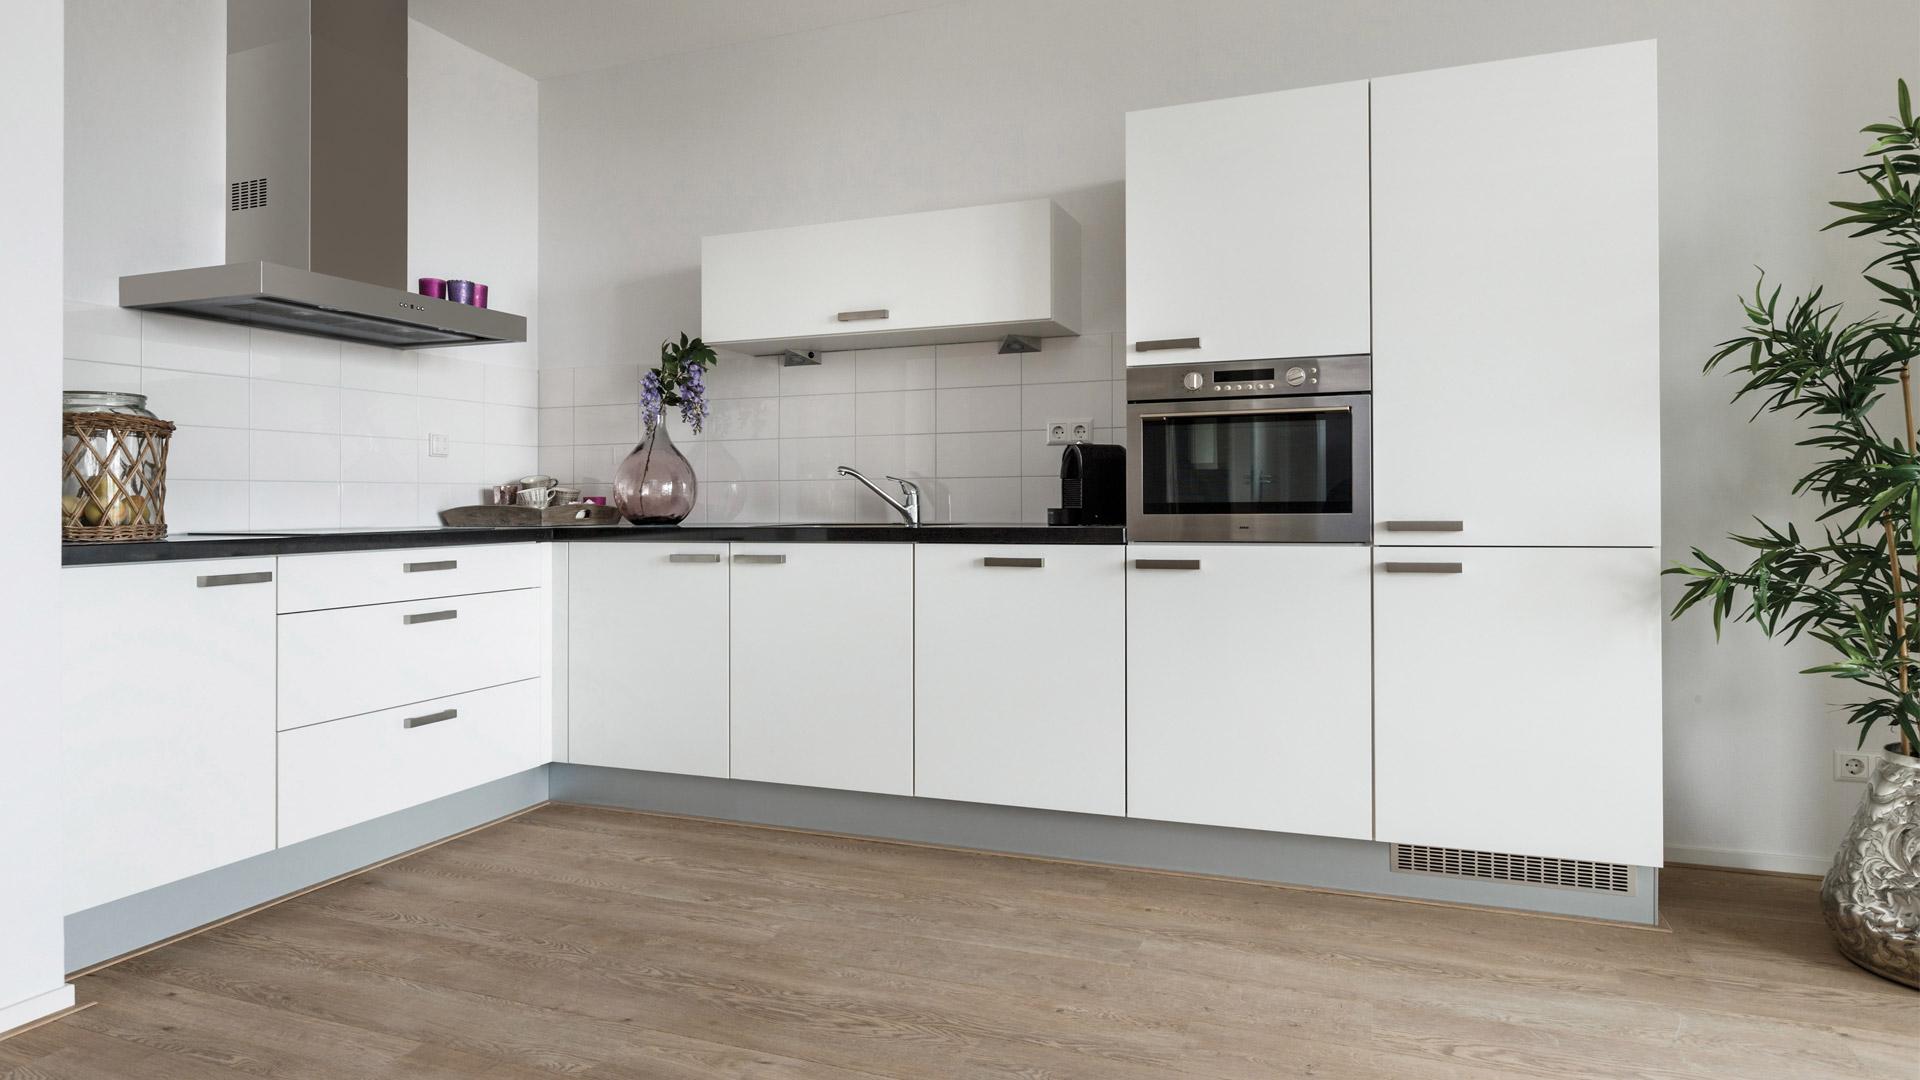 Keuken wit great keuken wit hoogglans cm incl rai with keuken wit